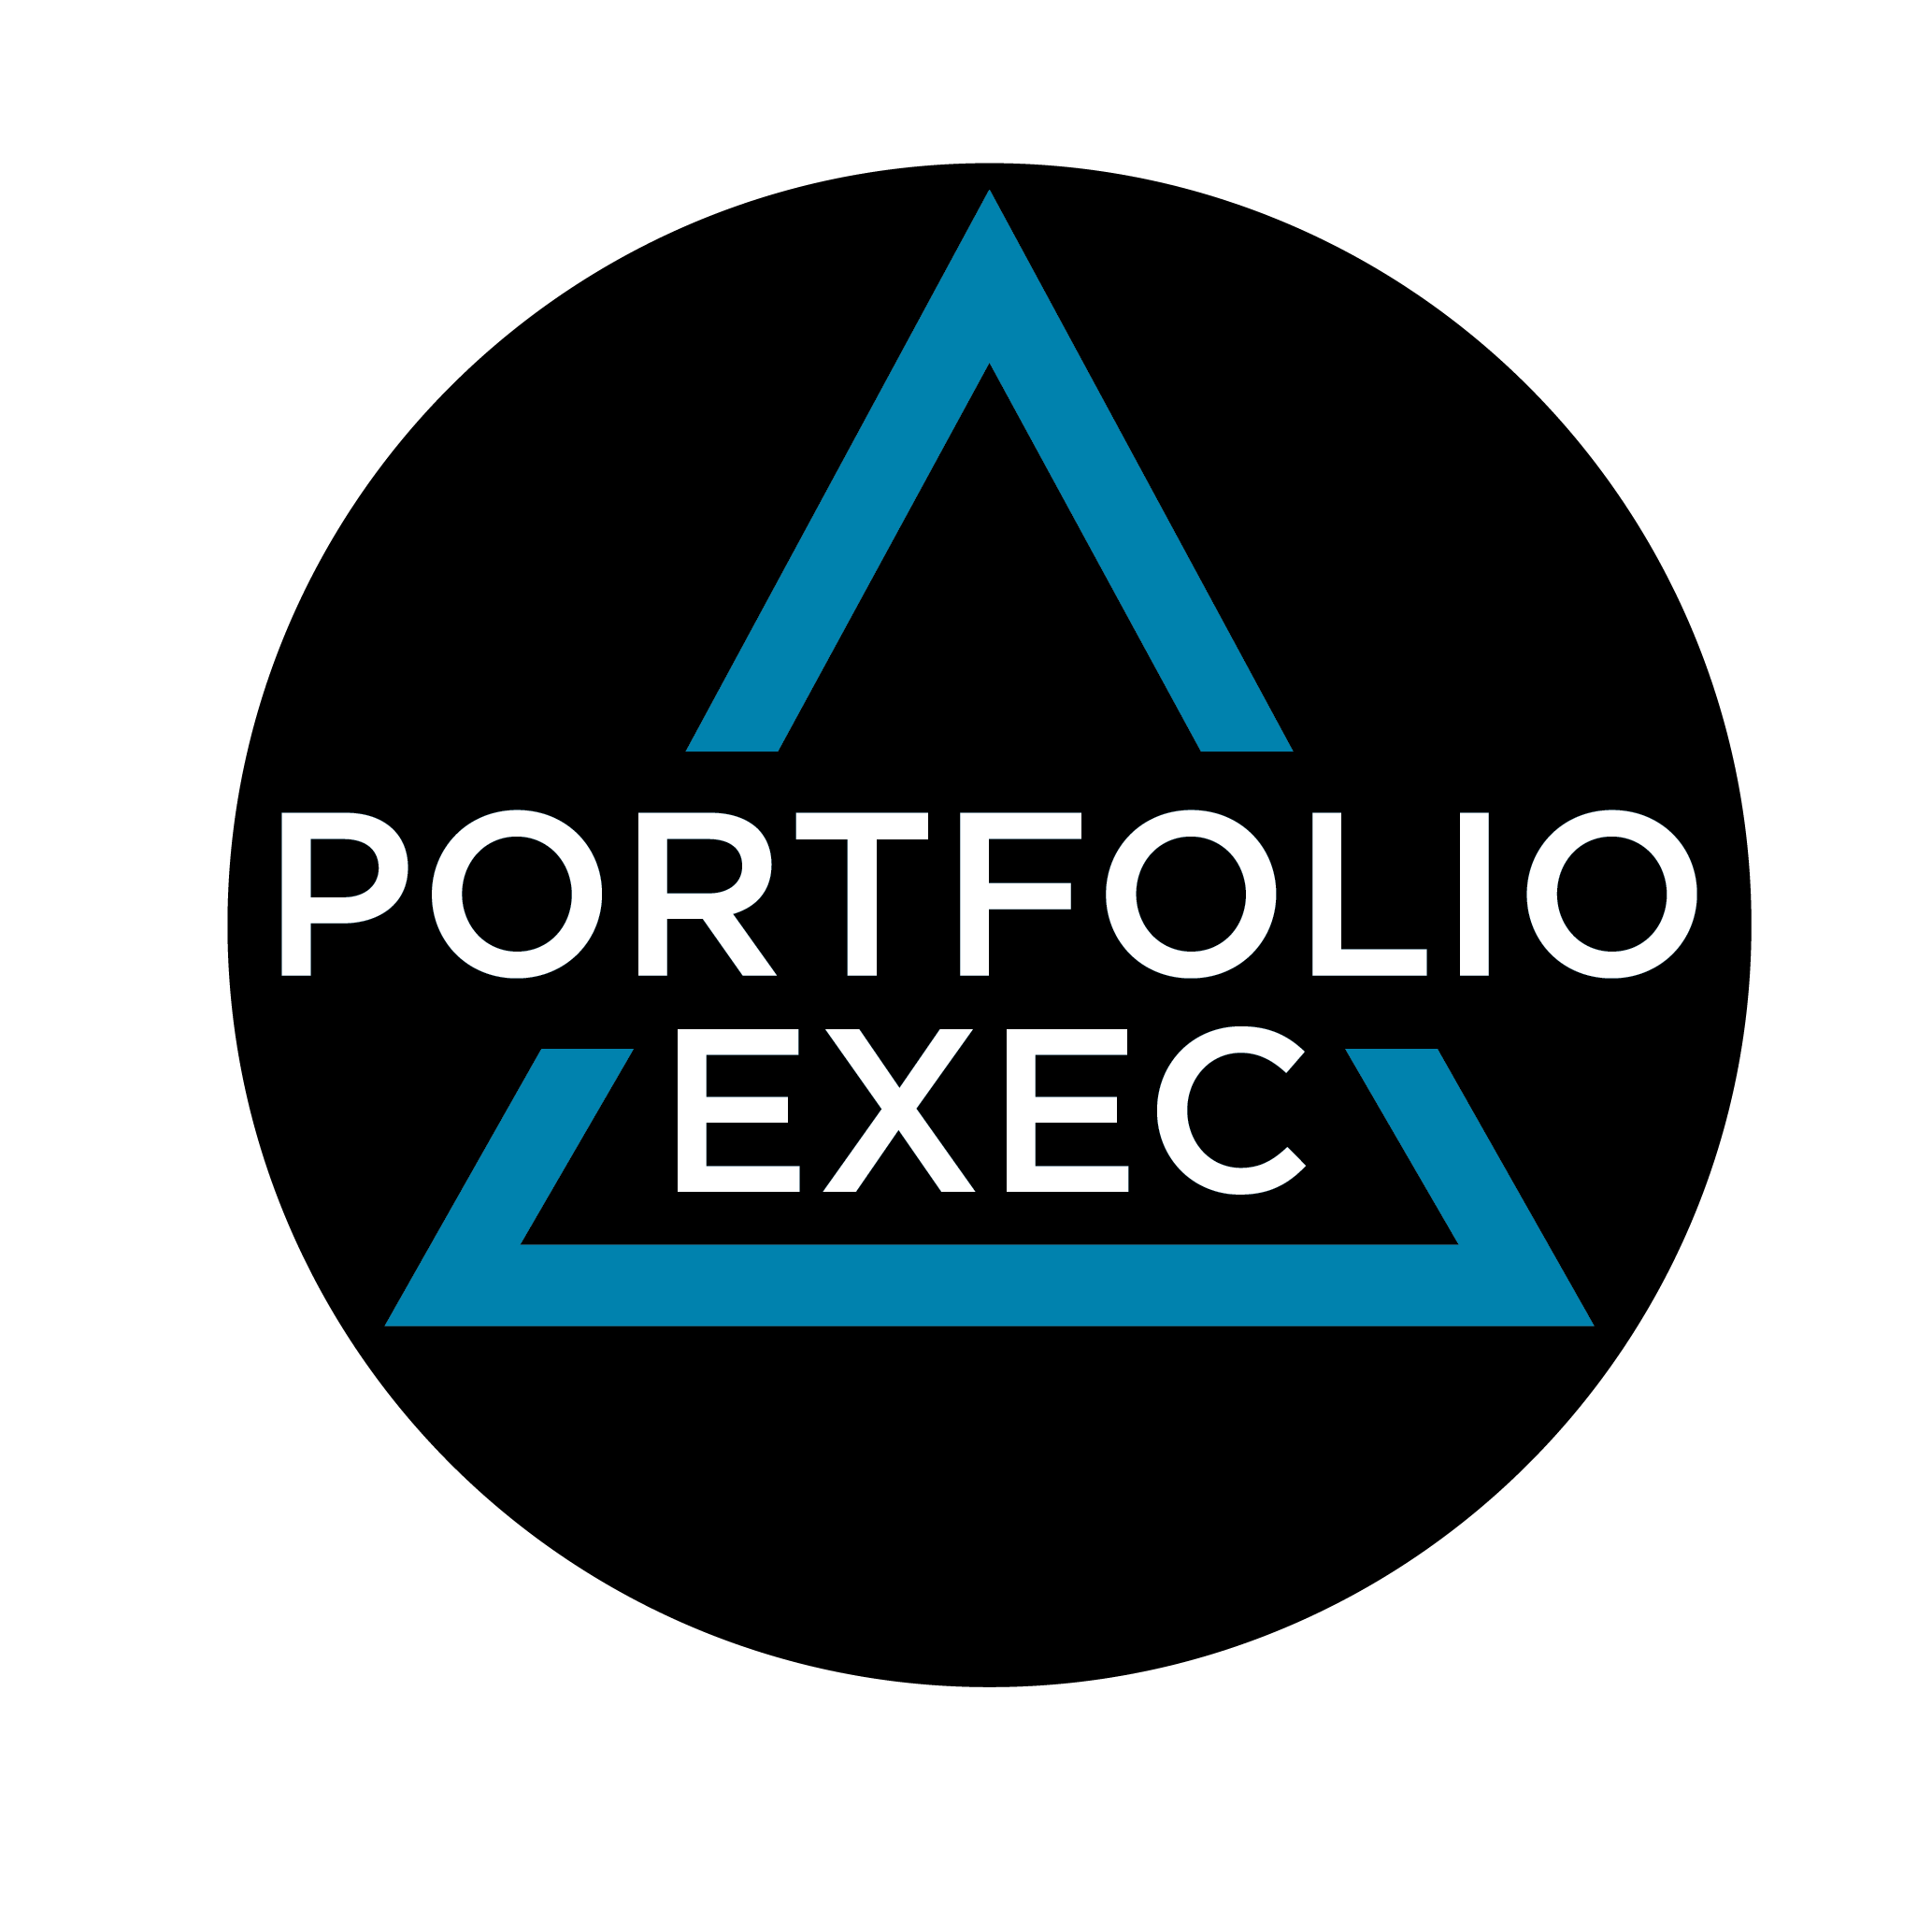 PortfolioExec